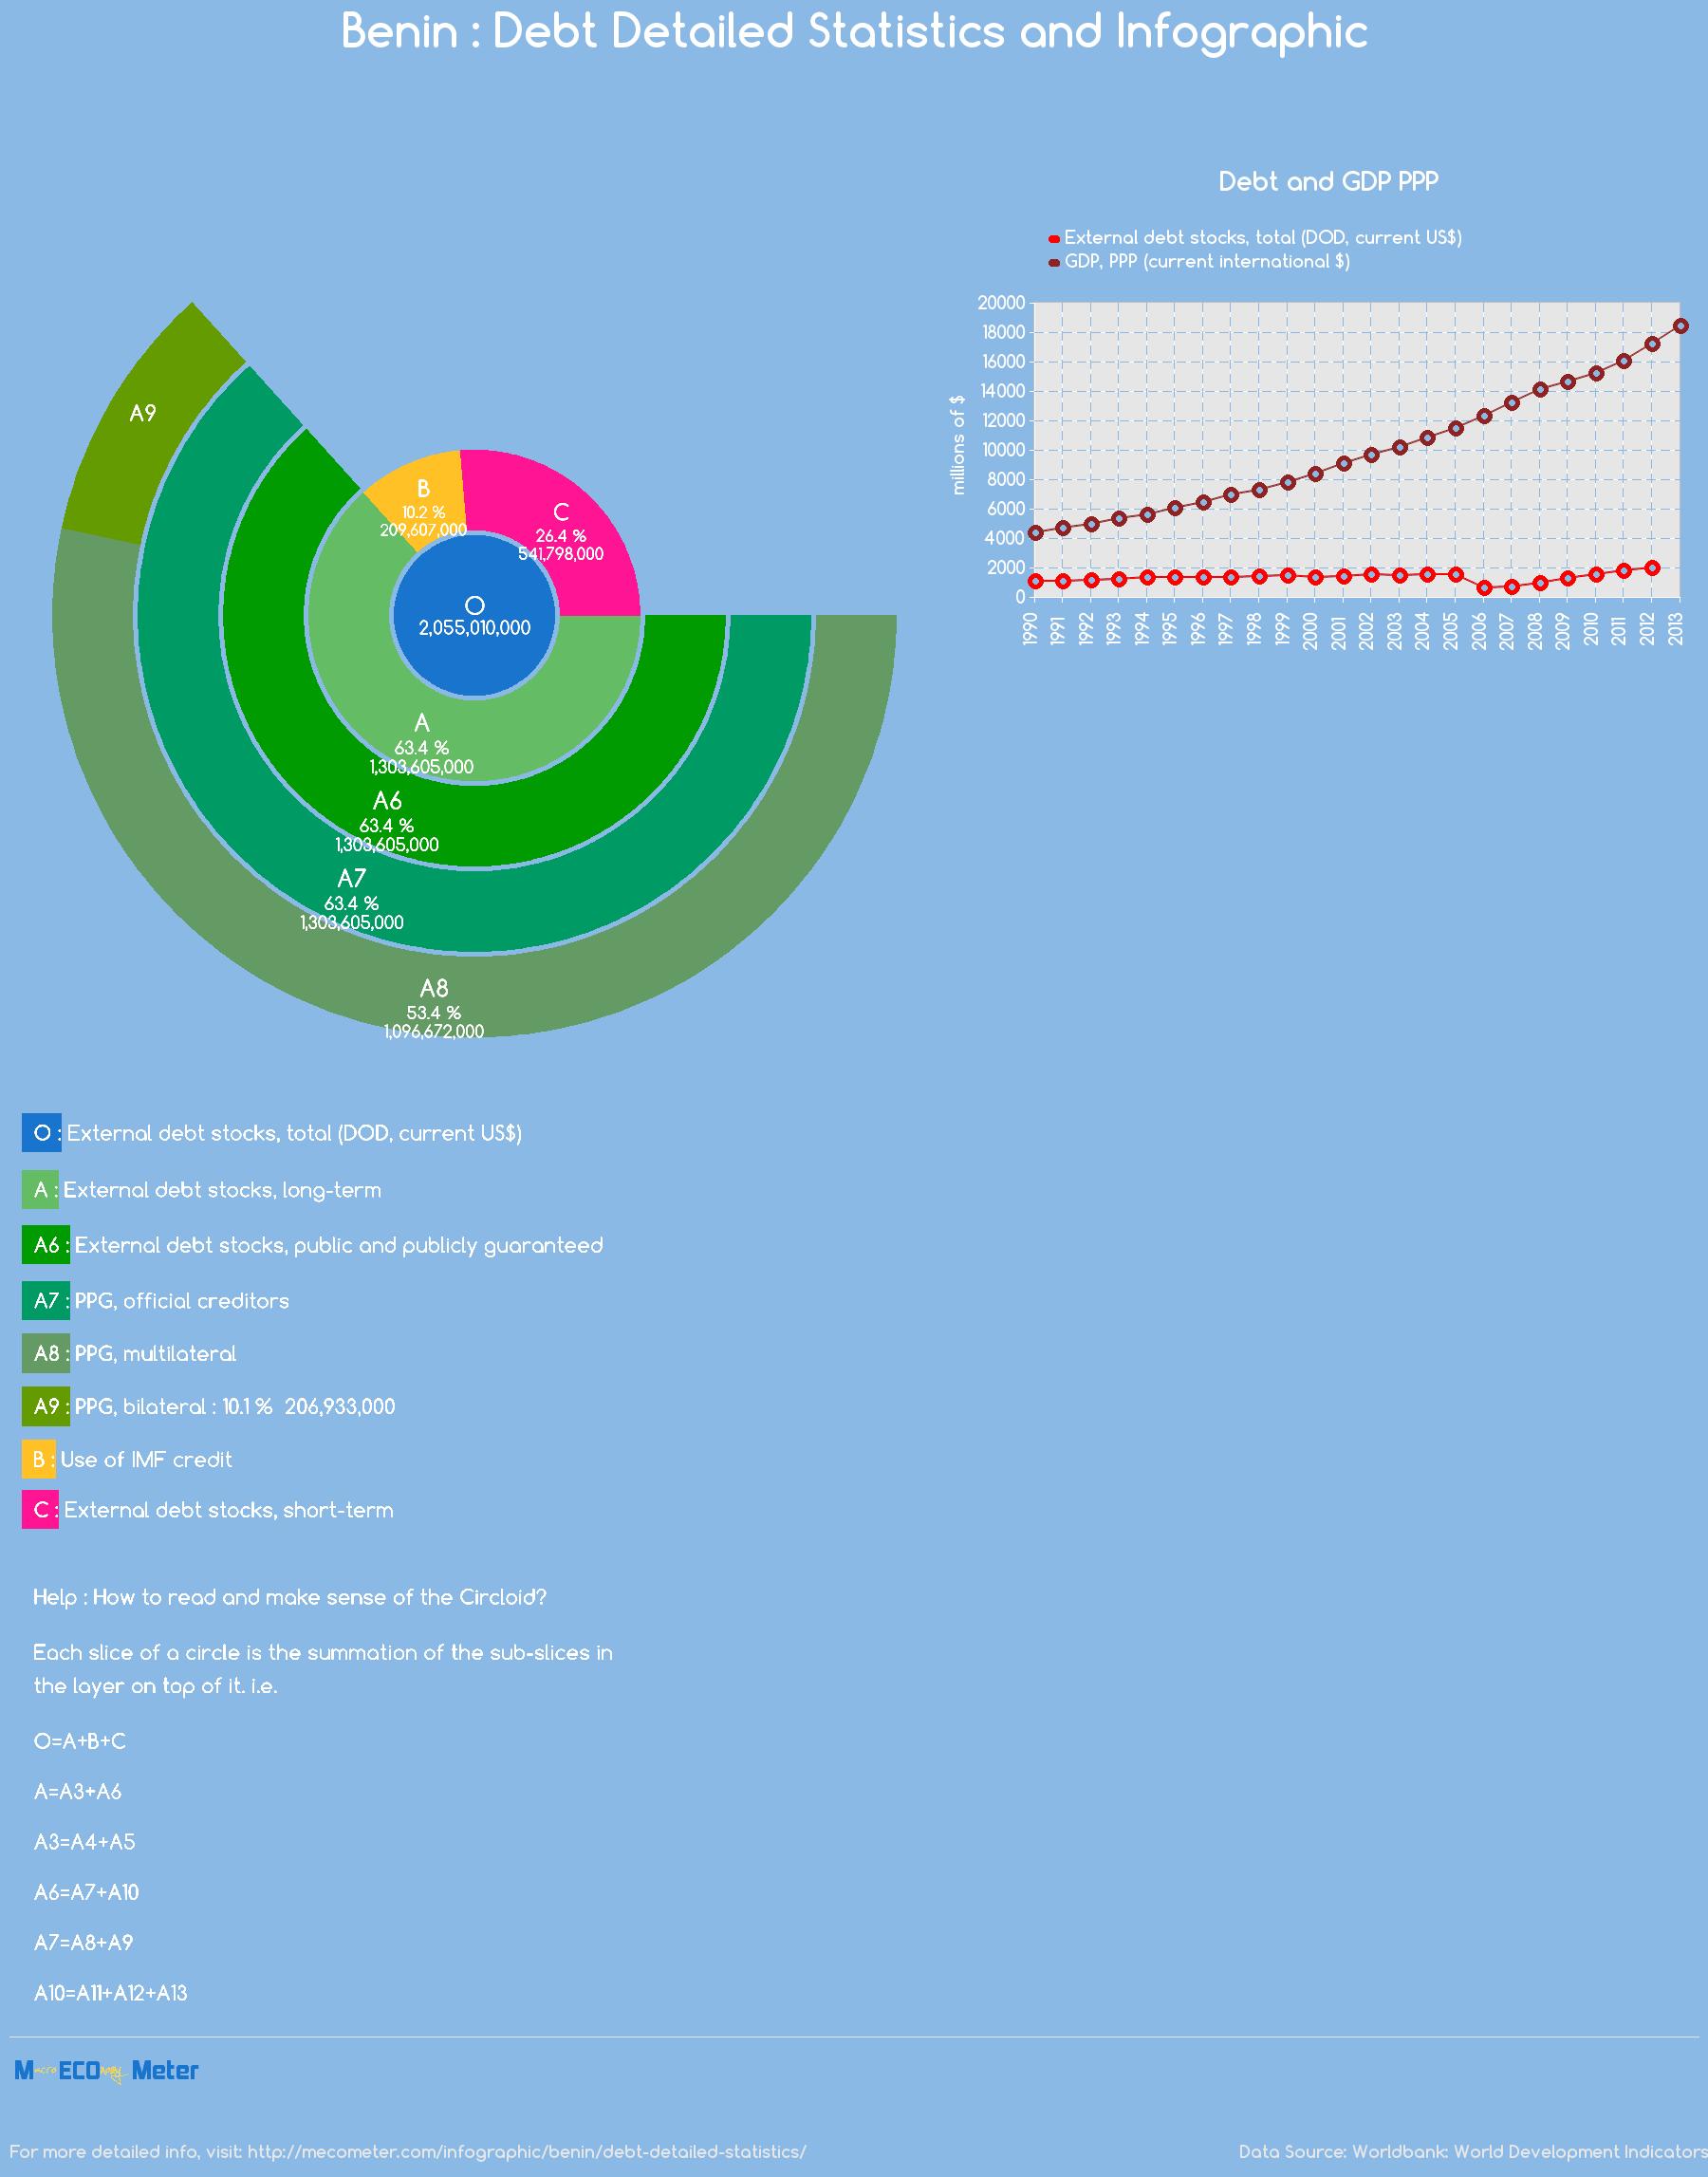 Benin : Debt Detailed Statistics and Infographic